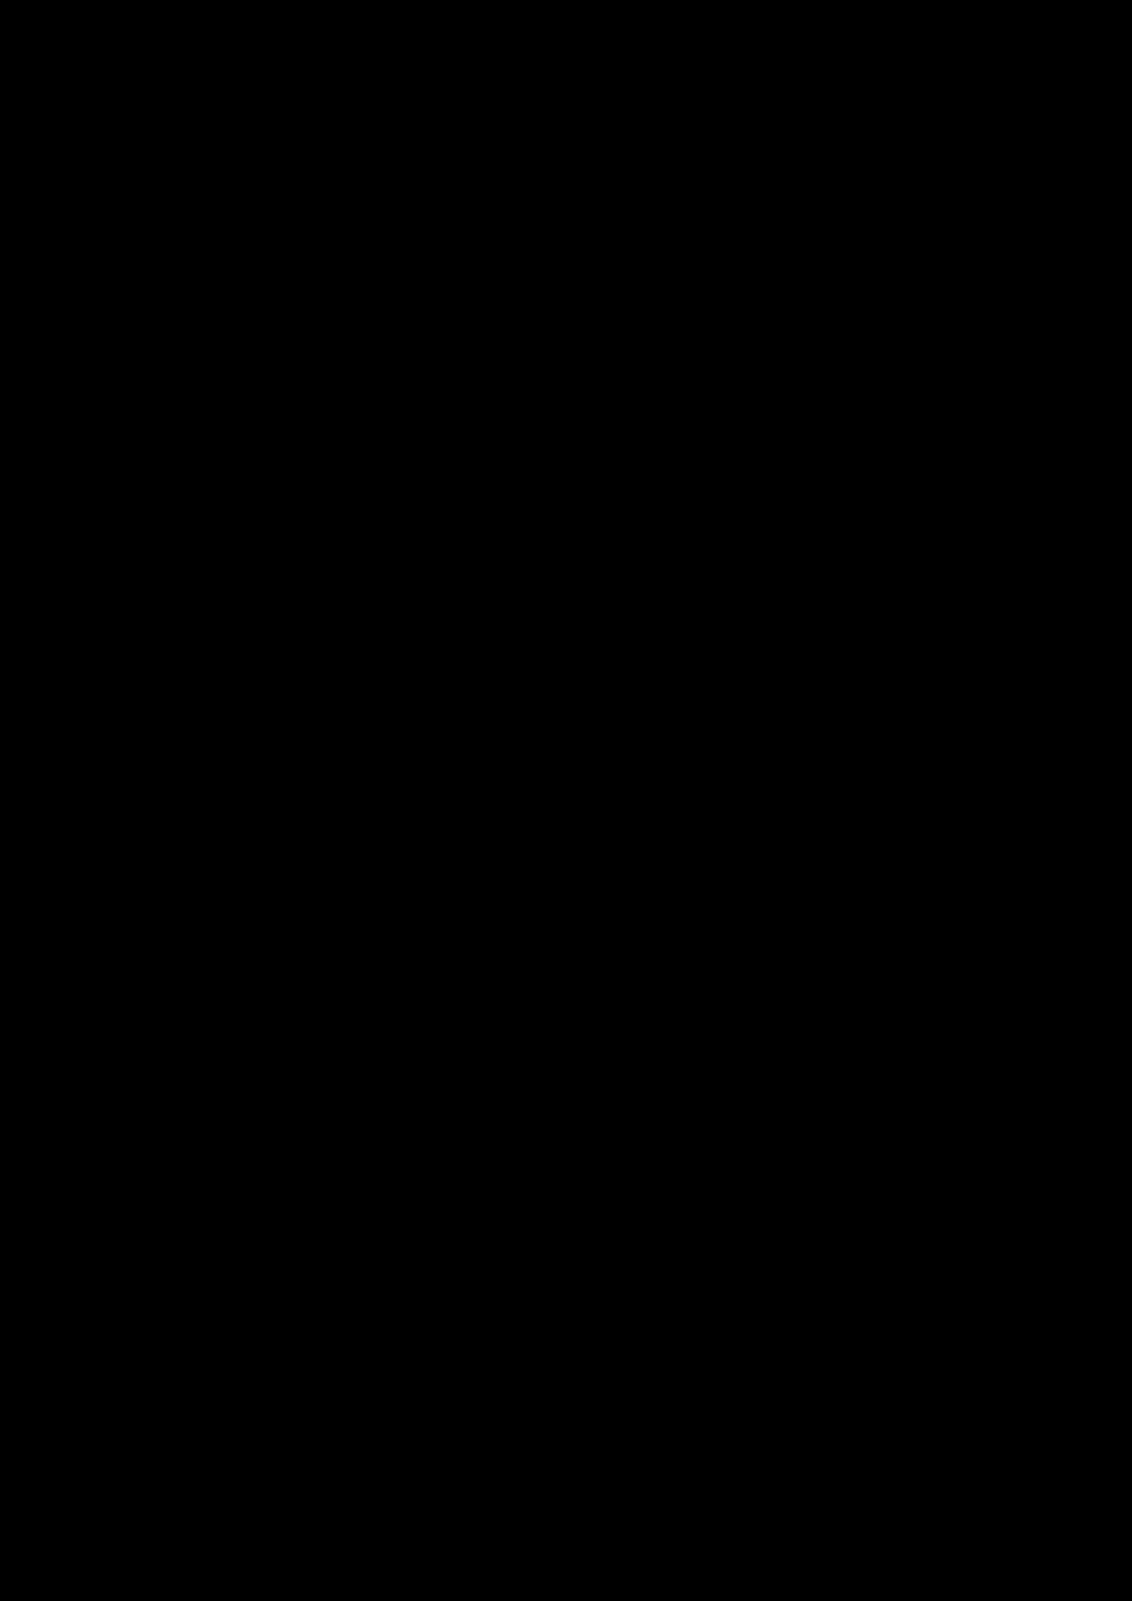 Prosti slide, Image 9